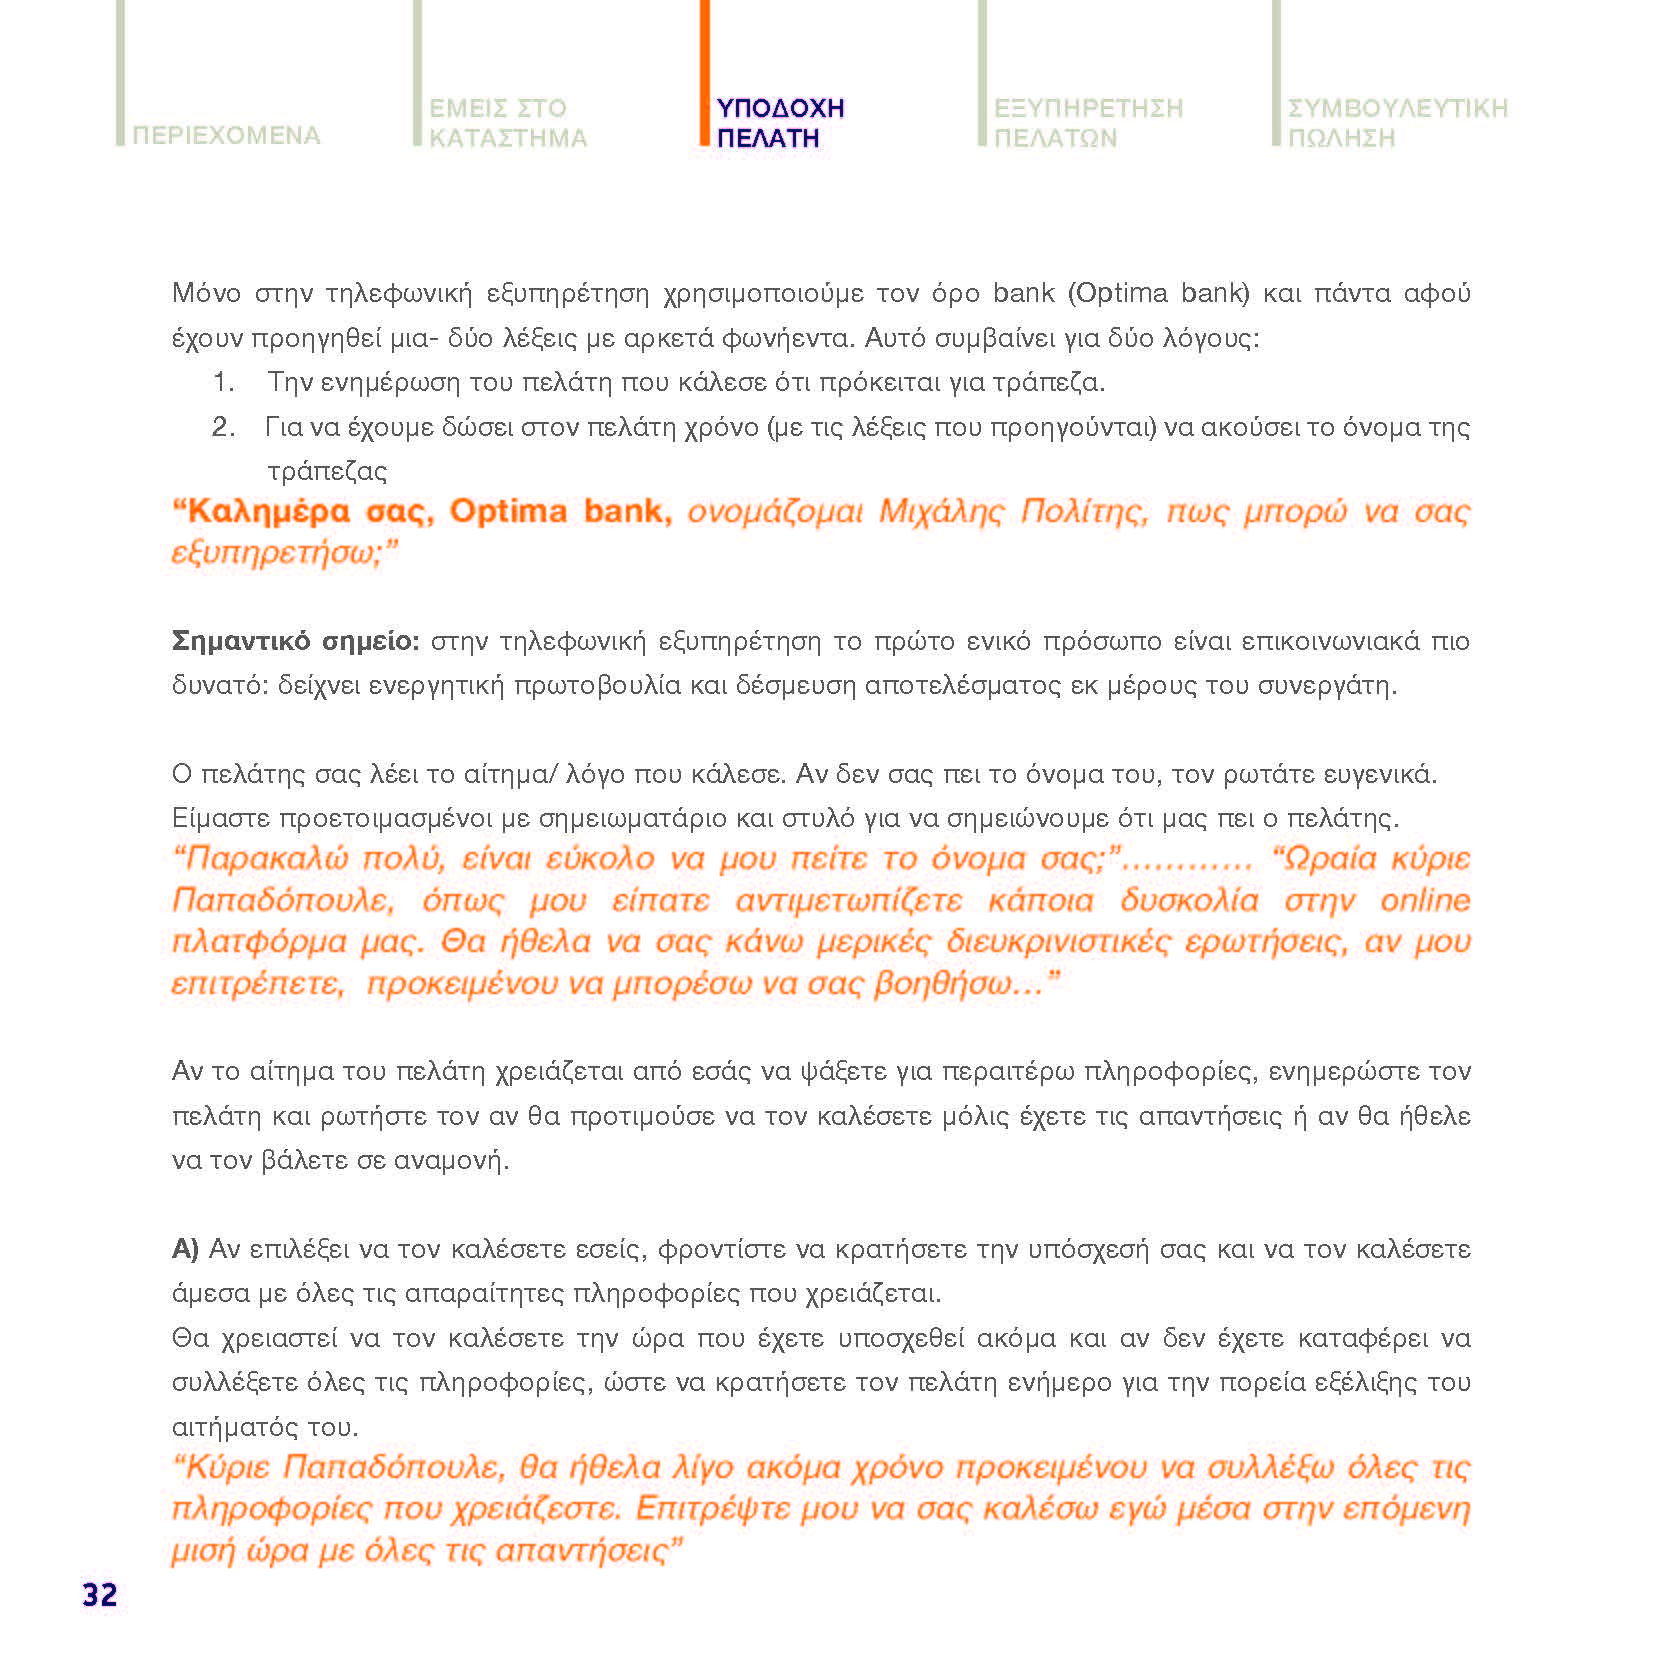 https://www.jib.gr/wp-content/uploads/2020/09/OPTIMA-BANK-BOOKLET-WEB_Page_032.jpg